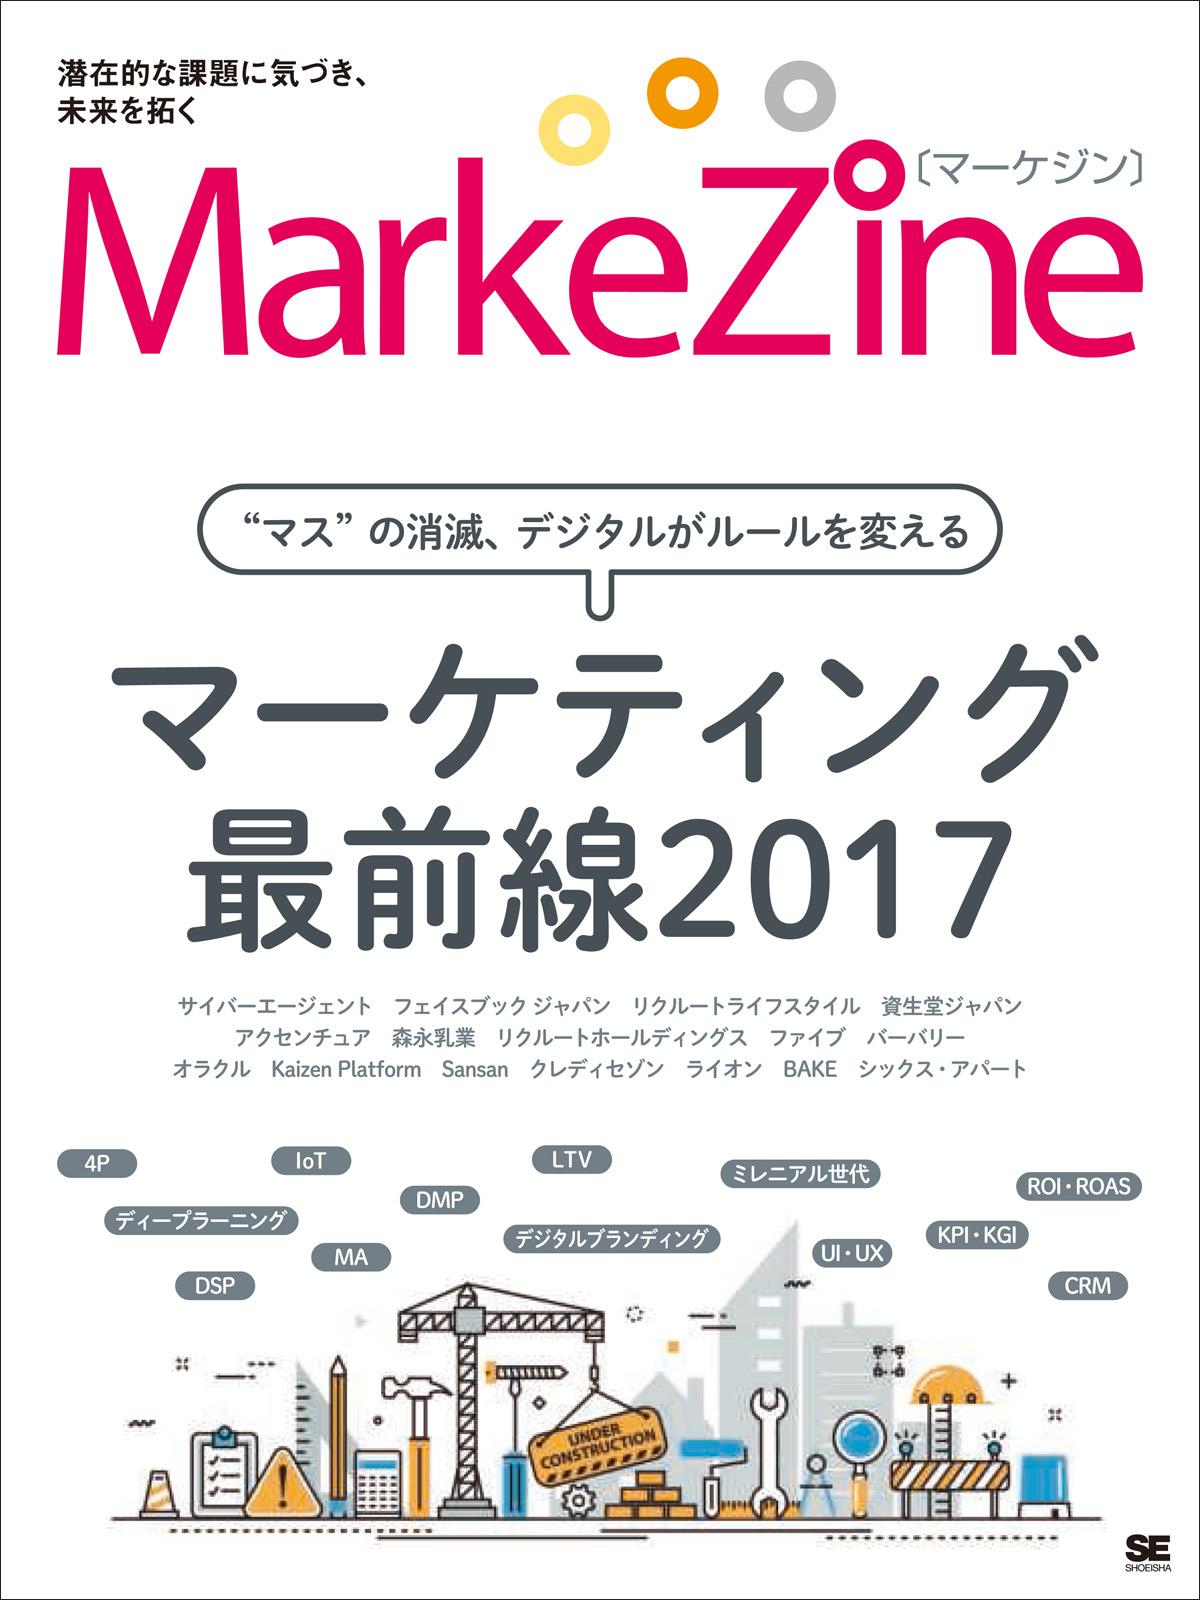 『MarkeZine マーケティング最前線2017』